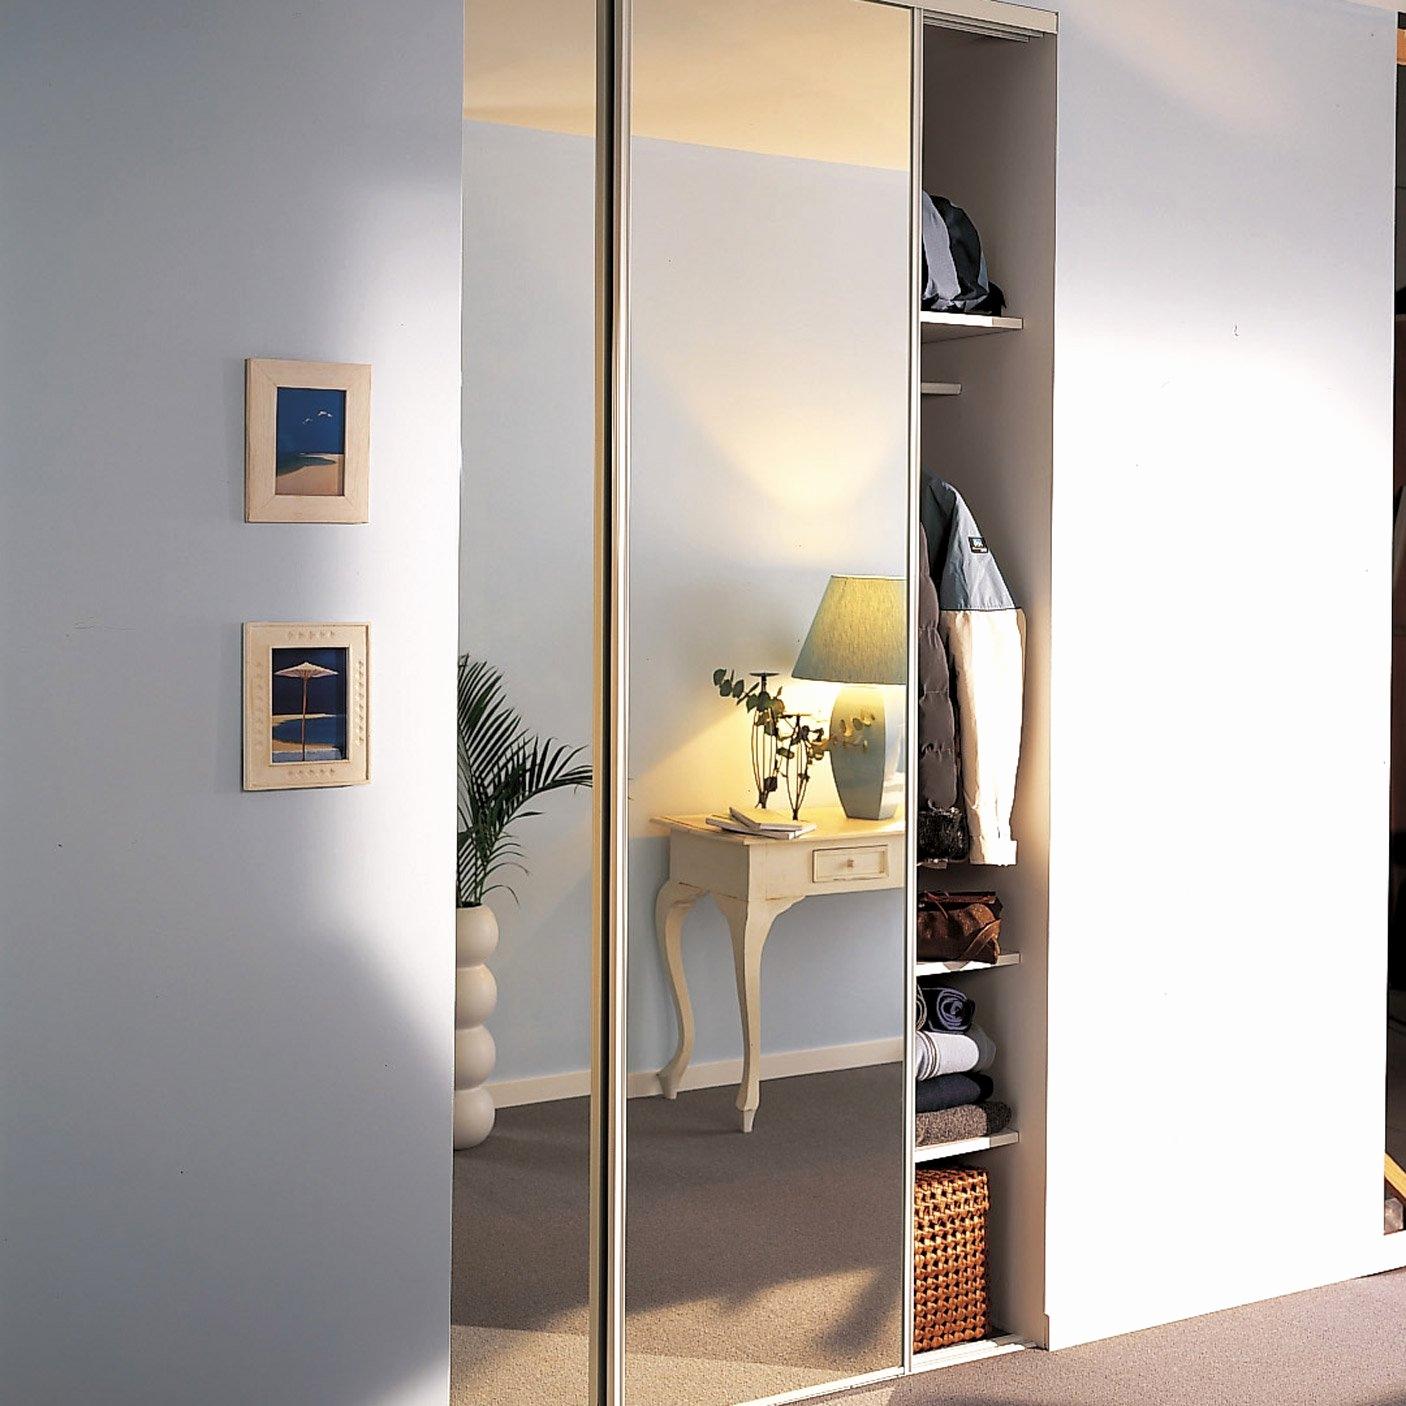 Portes Saloon Leroy Merlin Impressionnant Photos Porte Aluminium Leroy Merlin Impressionnant Cendrier Mural Leroy